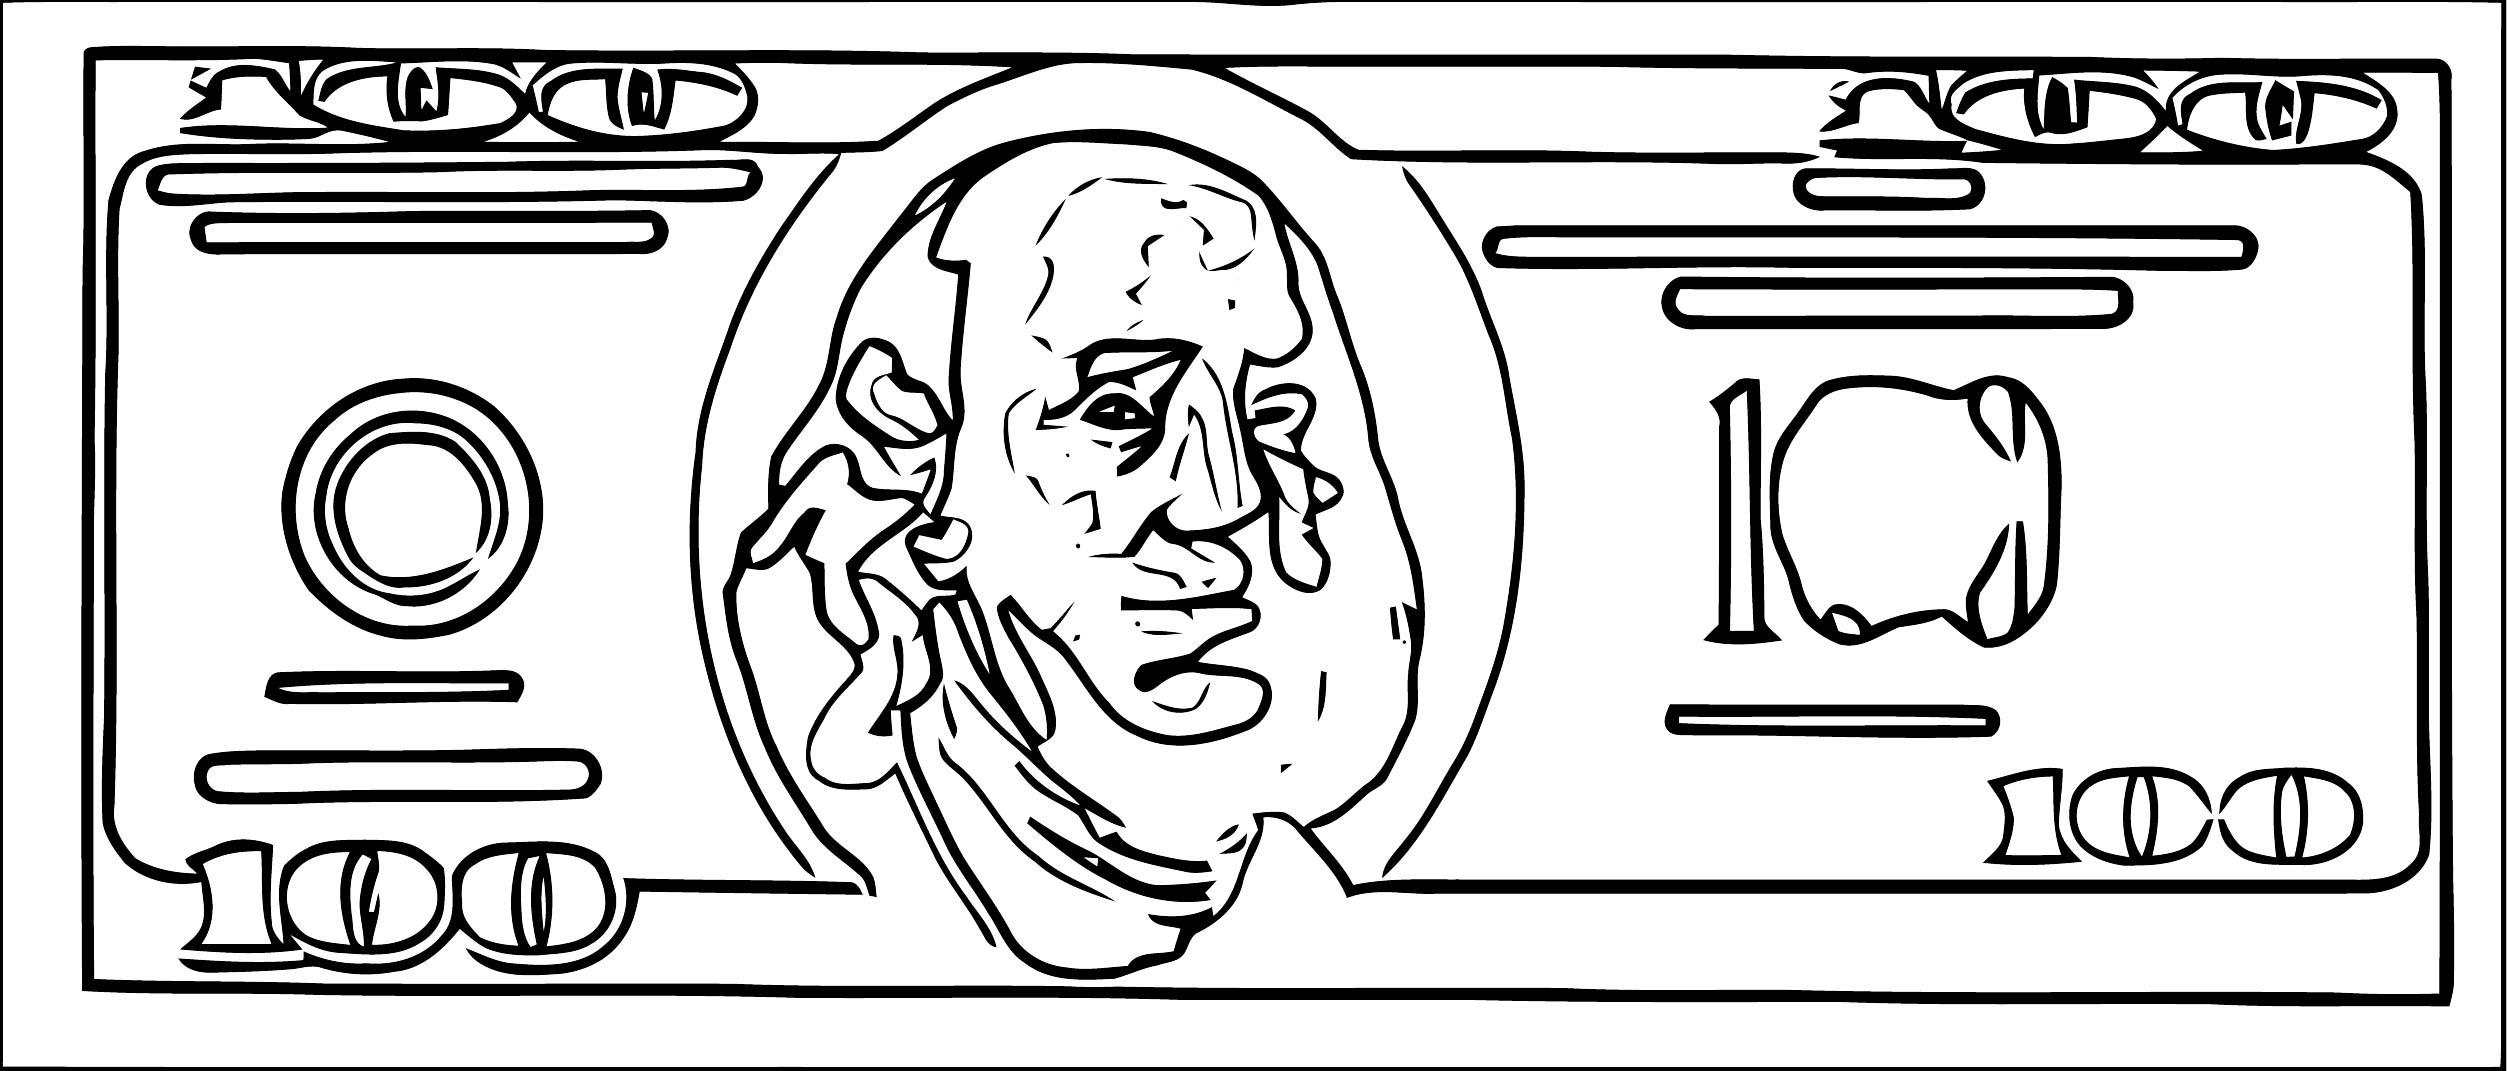 Paper Money Clip Art Free Stock Photo Public Domain Pictures Coloring Page